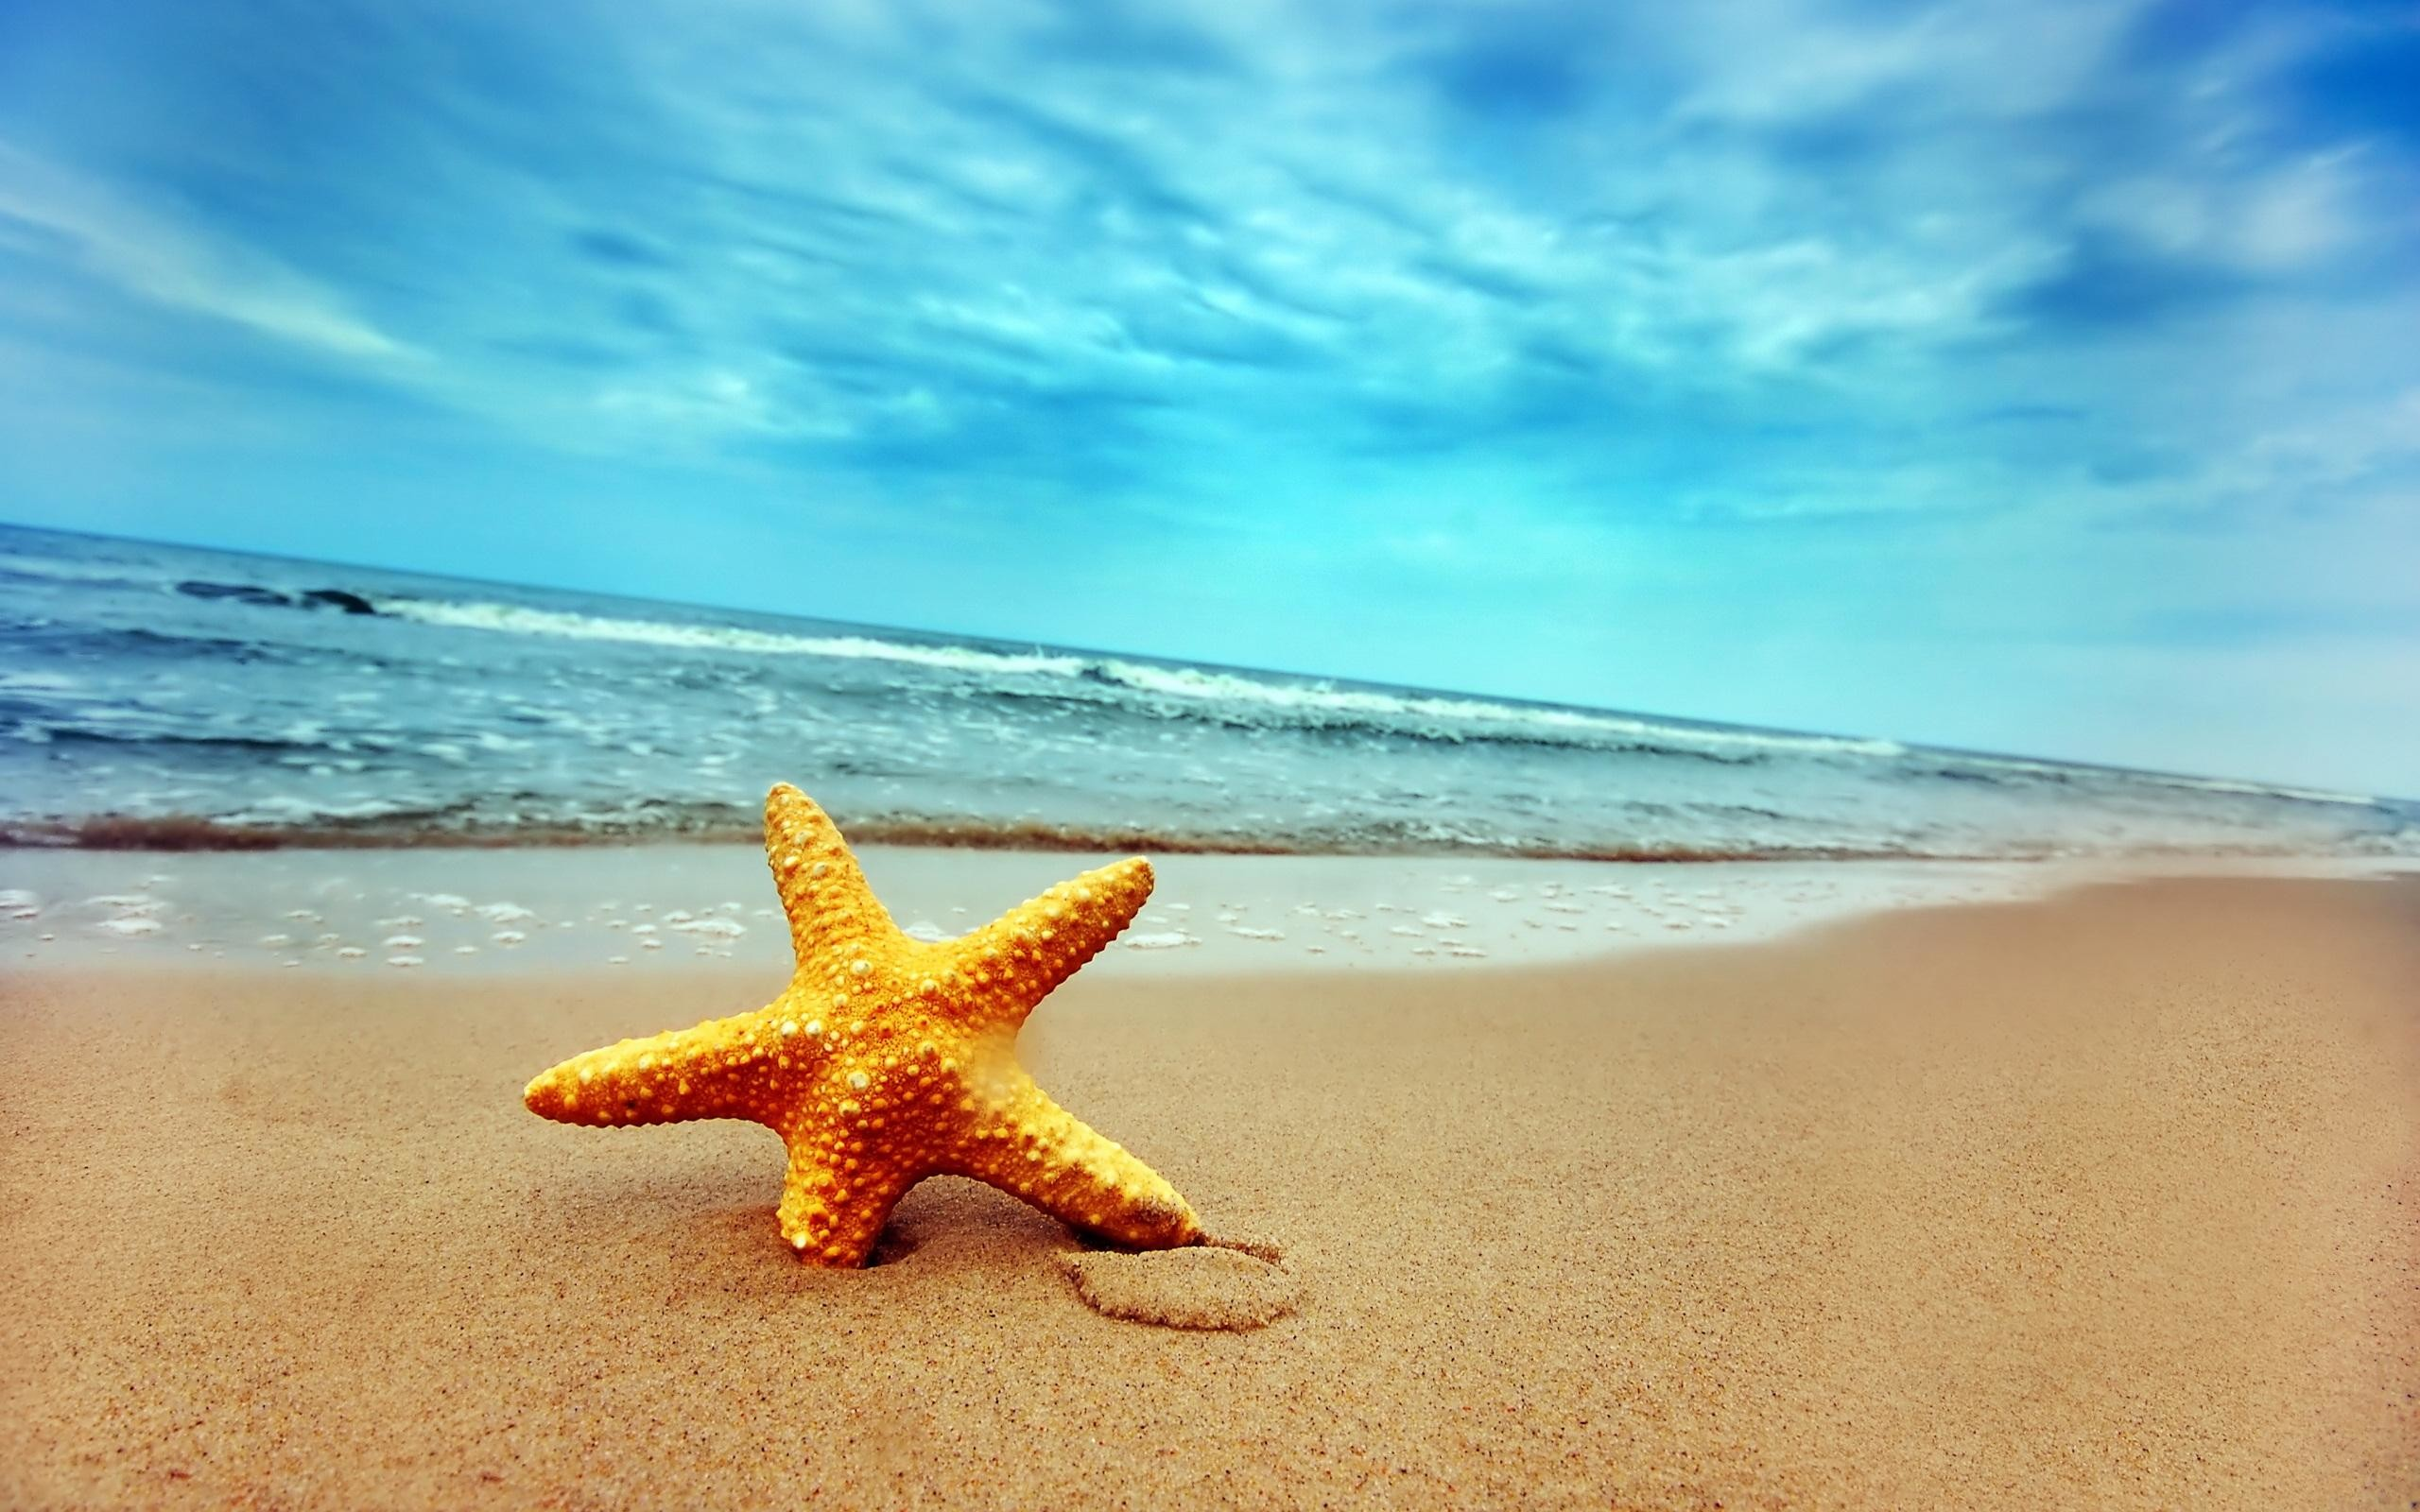 Starfish on Beach Desktop Wallpaper Background Desktop Wallpaper .